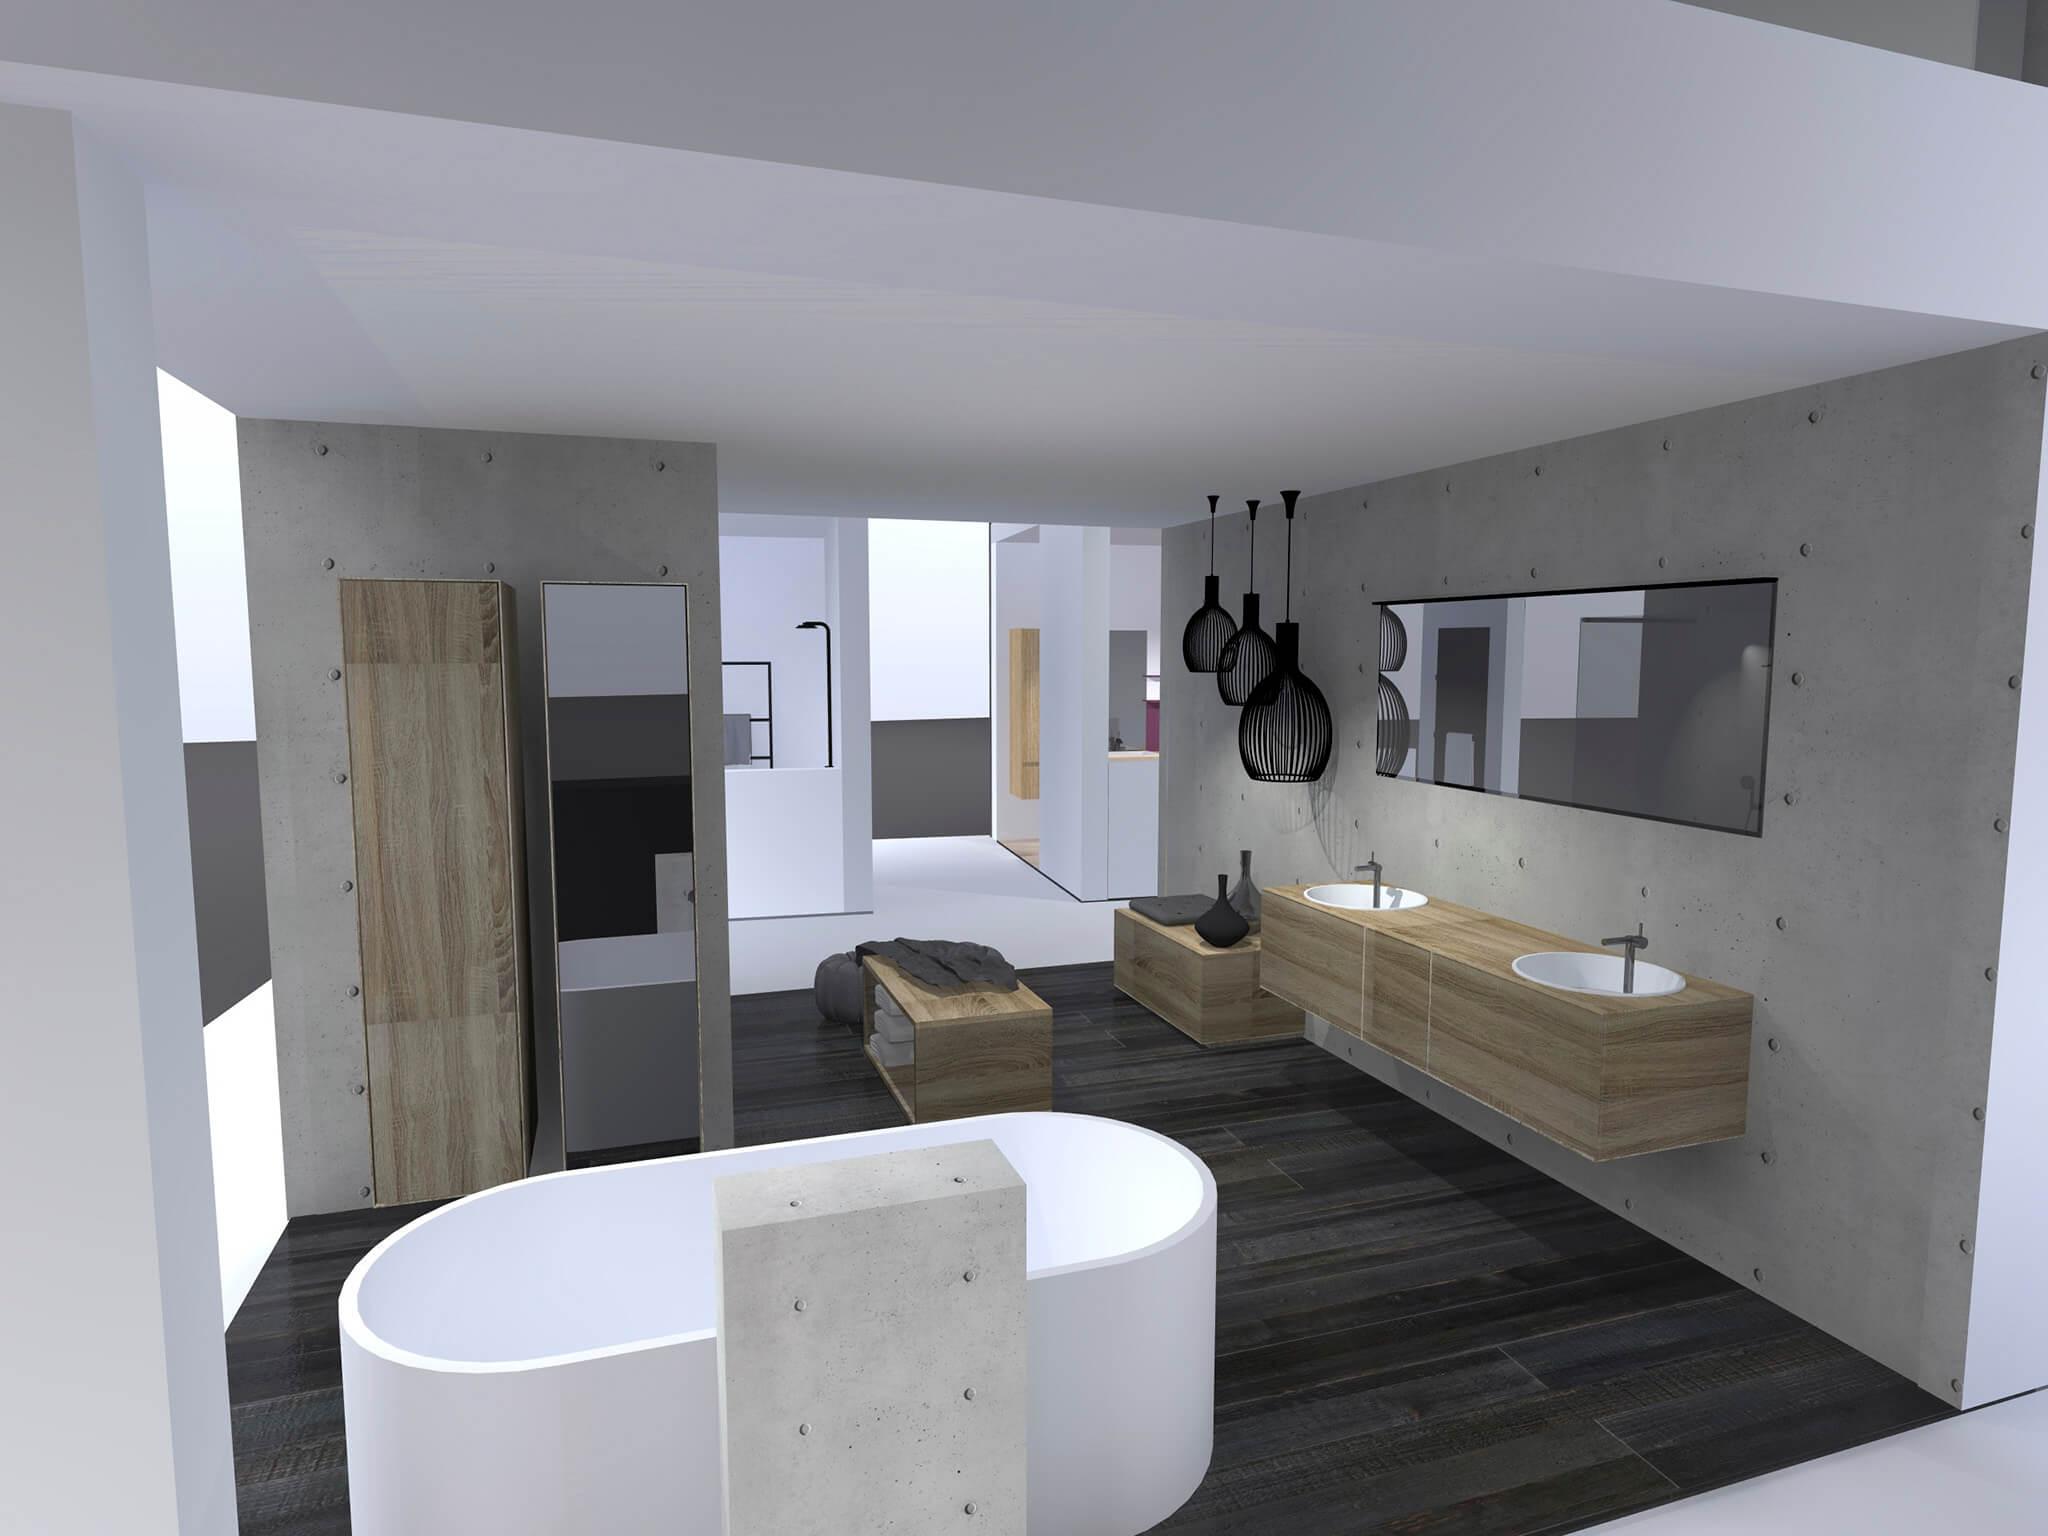 Led In Slaapkamer : Badkamer spiegelkast verlichting gamma badkamer spiegelkast